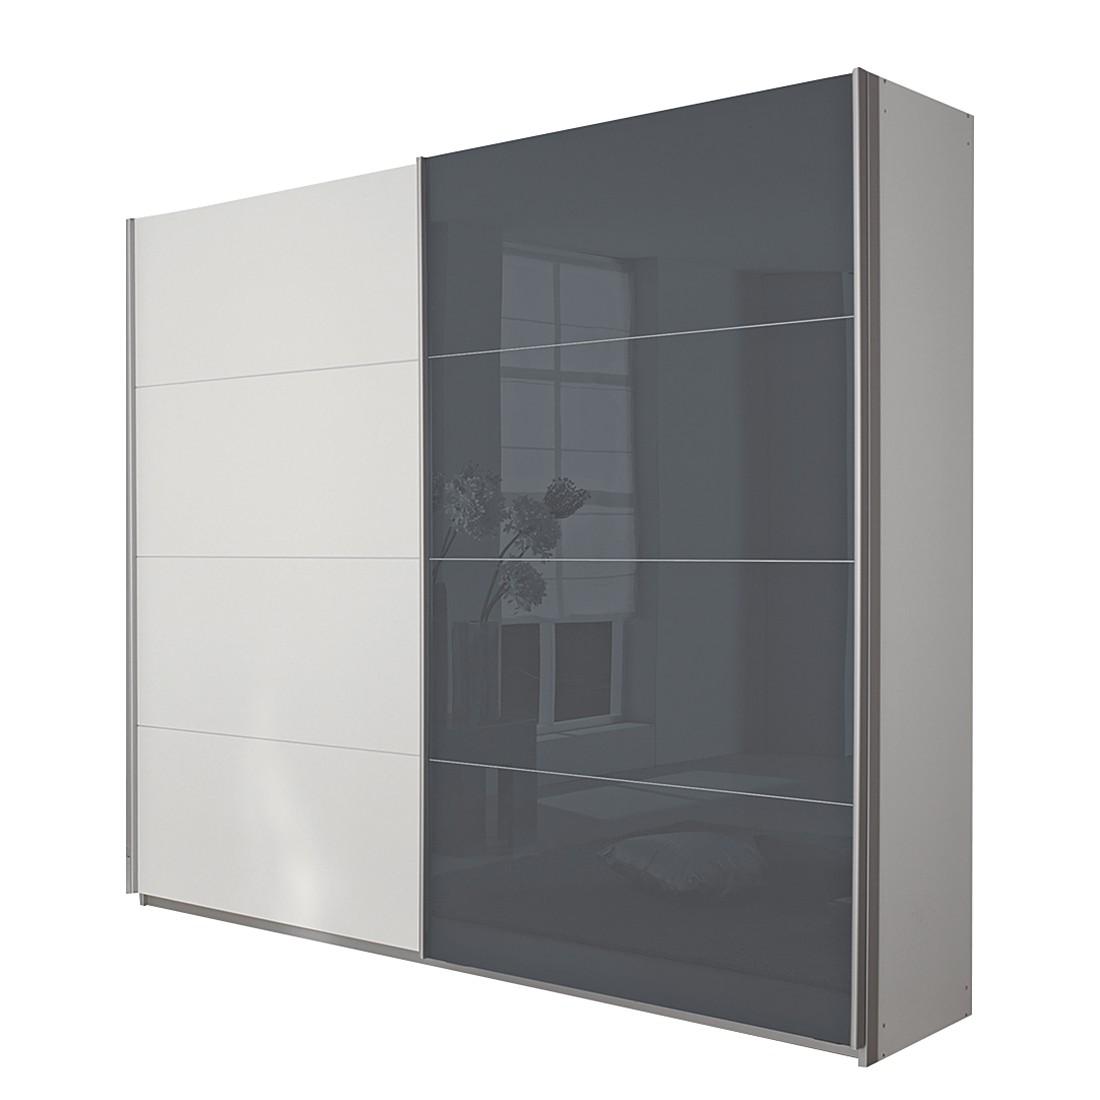 goedkoop Schuifdeurkast Quadra alpinewit grijs 226cm 2 deurs 210cm Rauch Packs